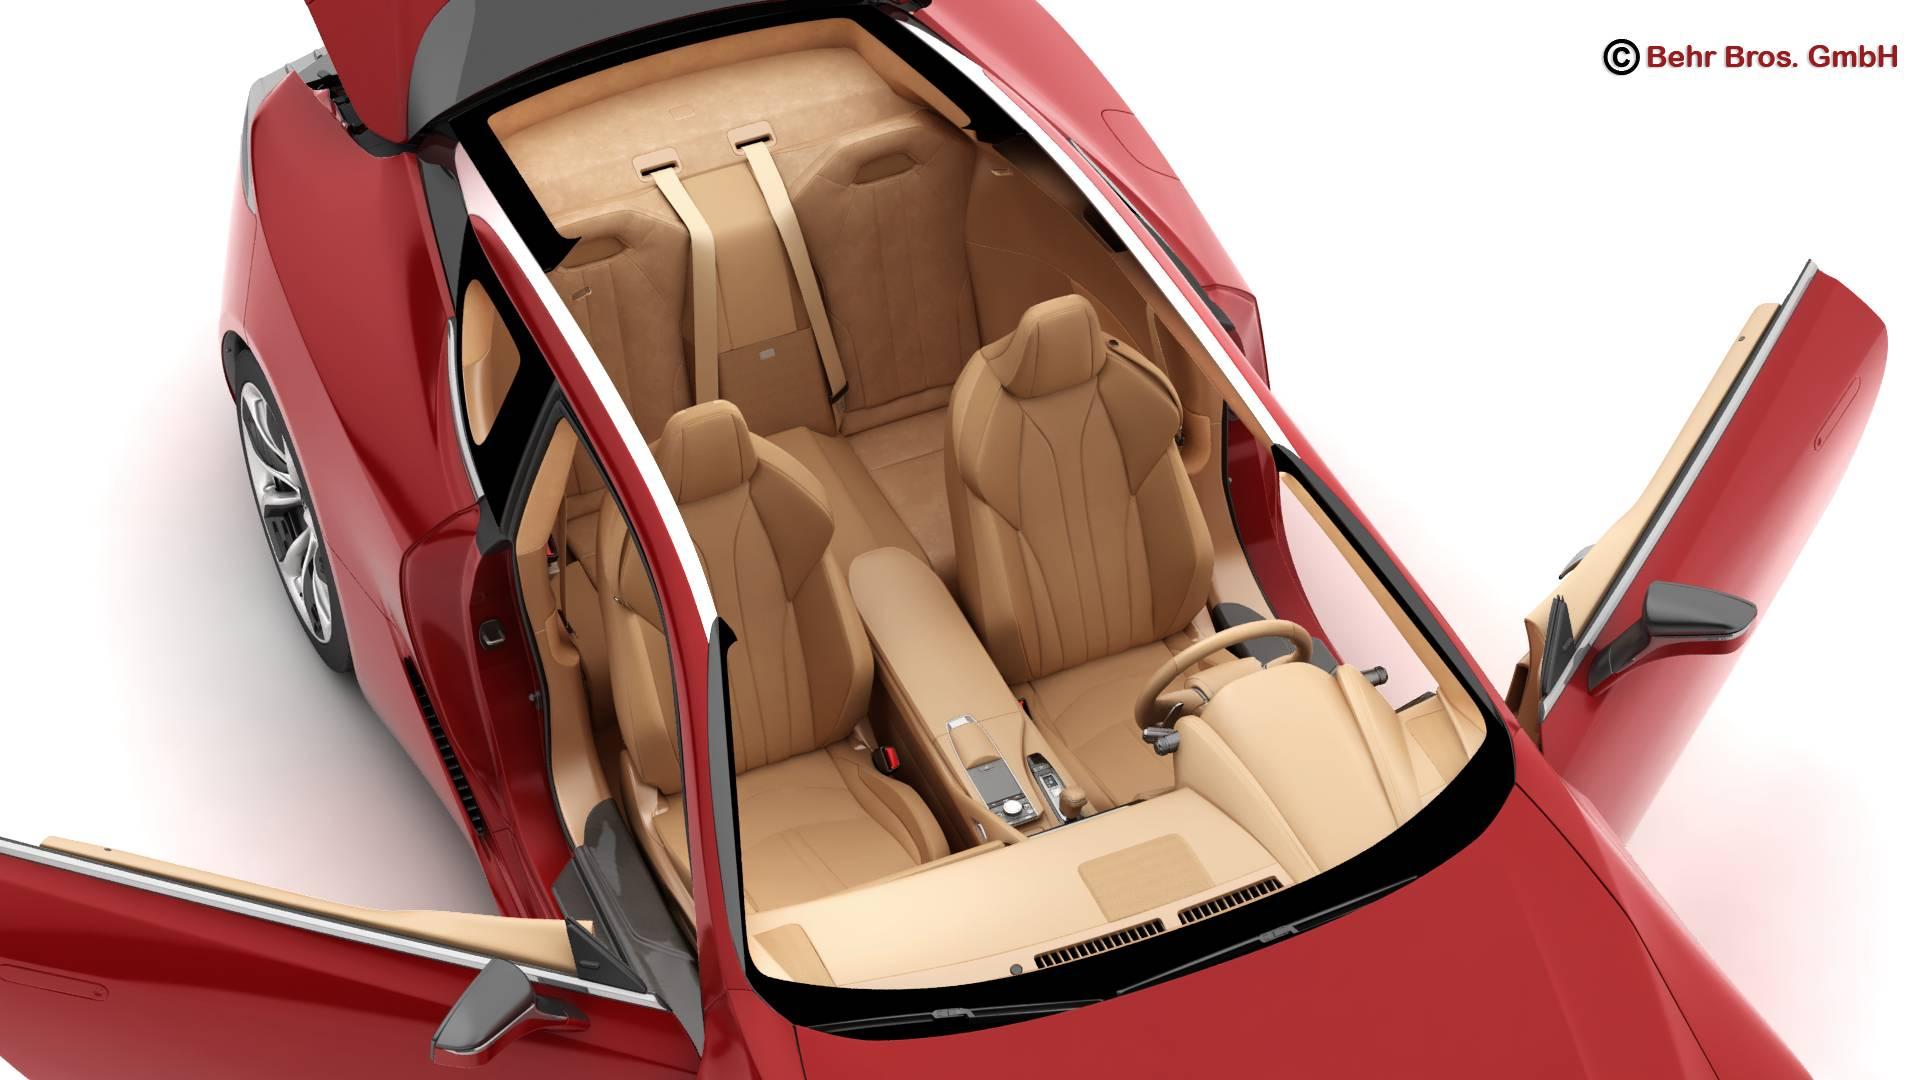 lexus lc 500 us hybrid 2018 3d model 3ds max fbx c4d lwo ma mb obj 267935